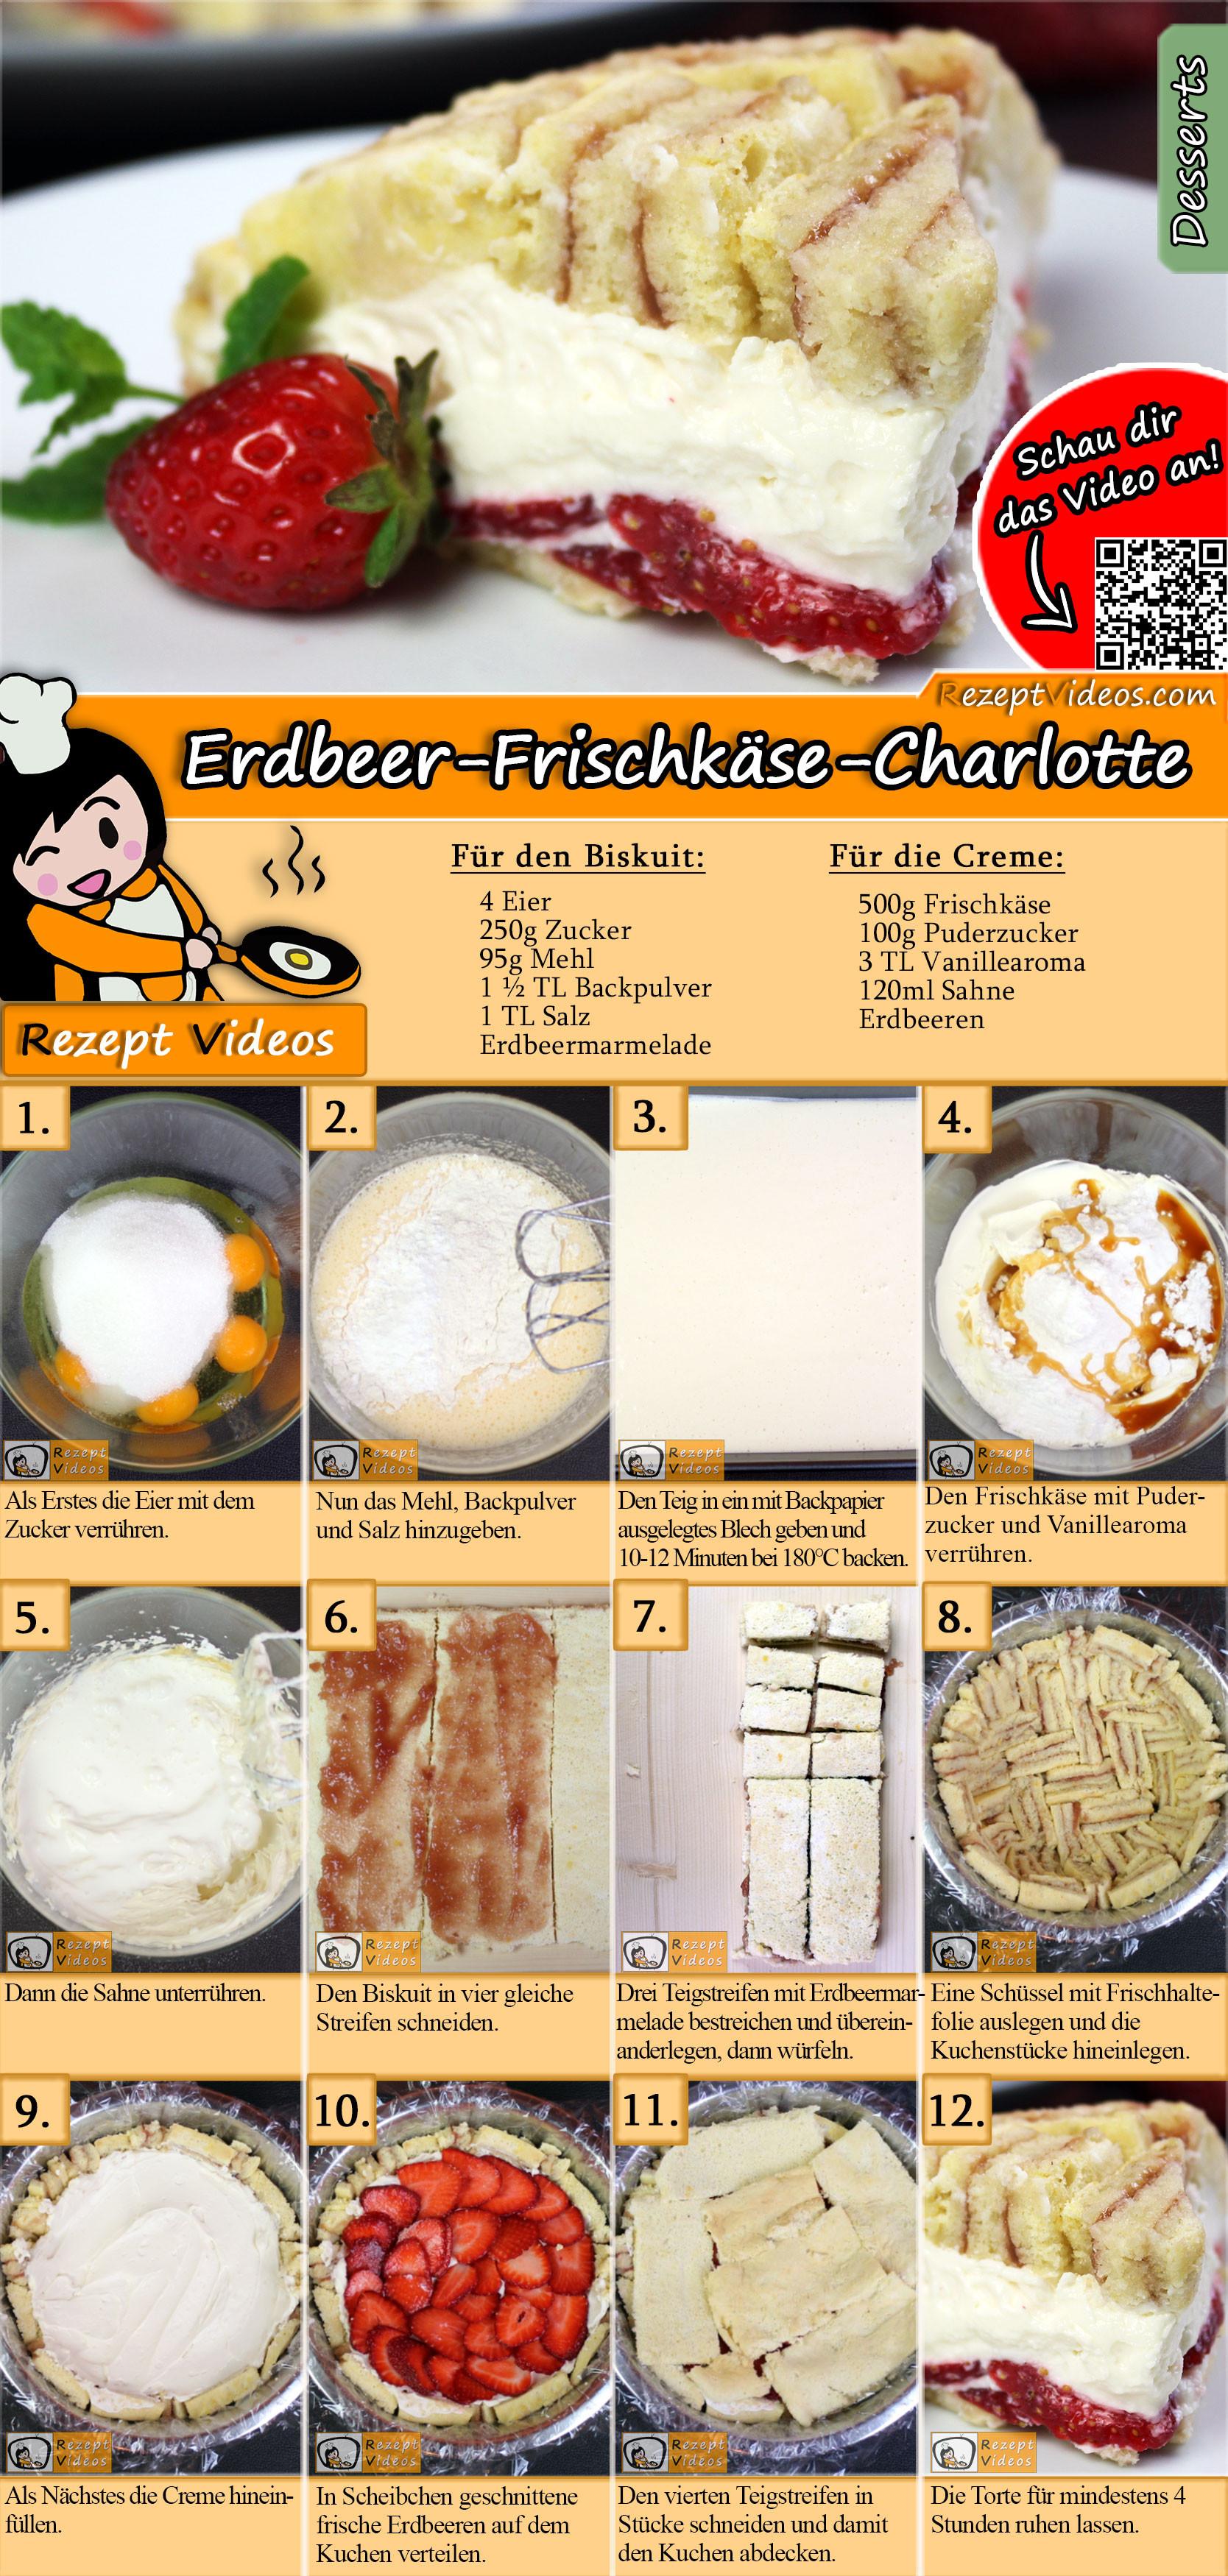 Erdbeer-Frischkäse-Charlotte Rezept mit Video